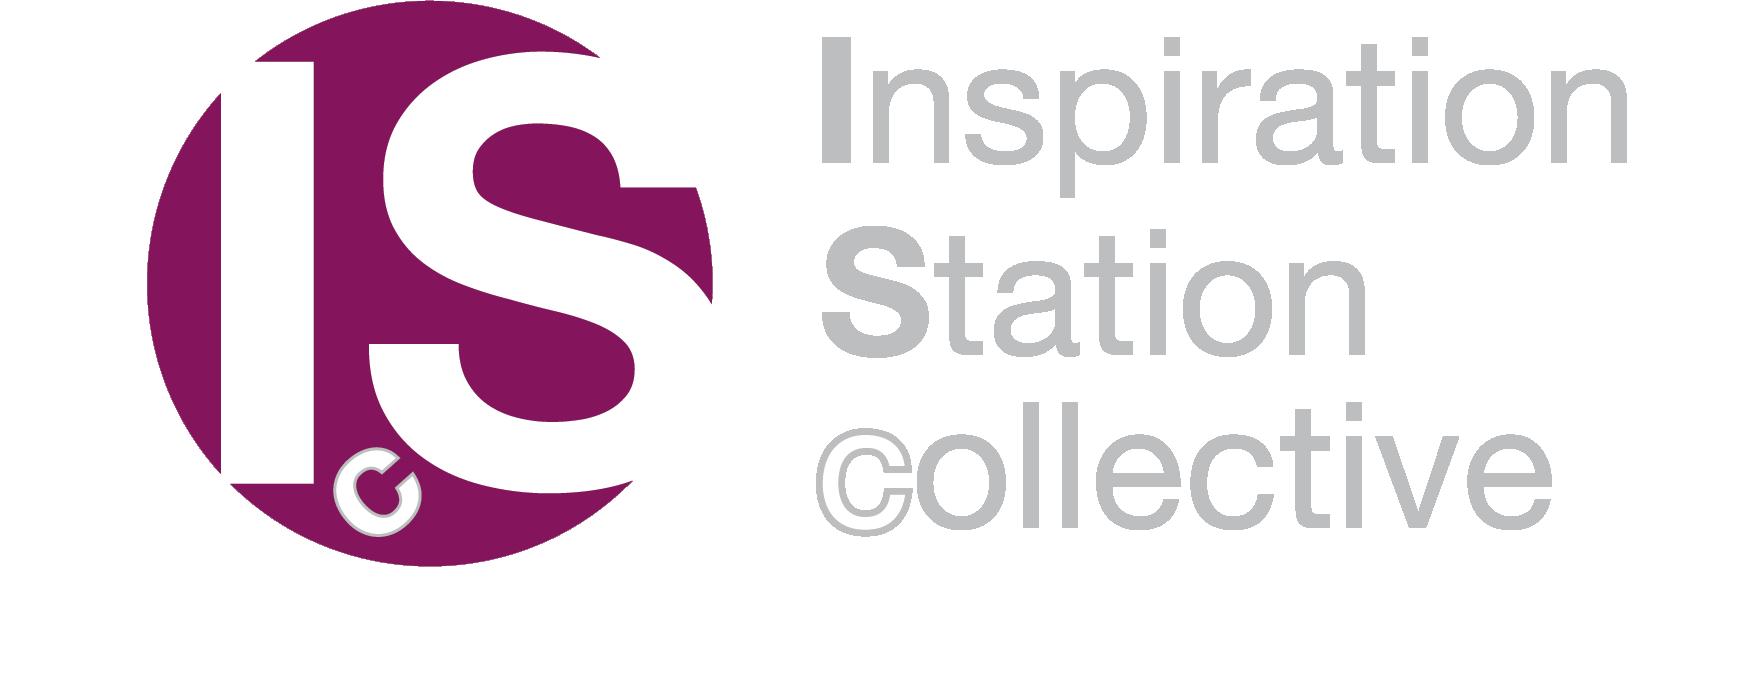 ISc_logo_long_rasberry-05-03.png